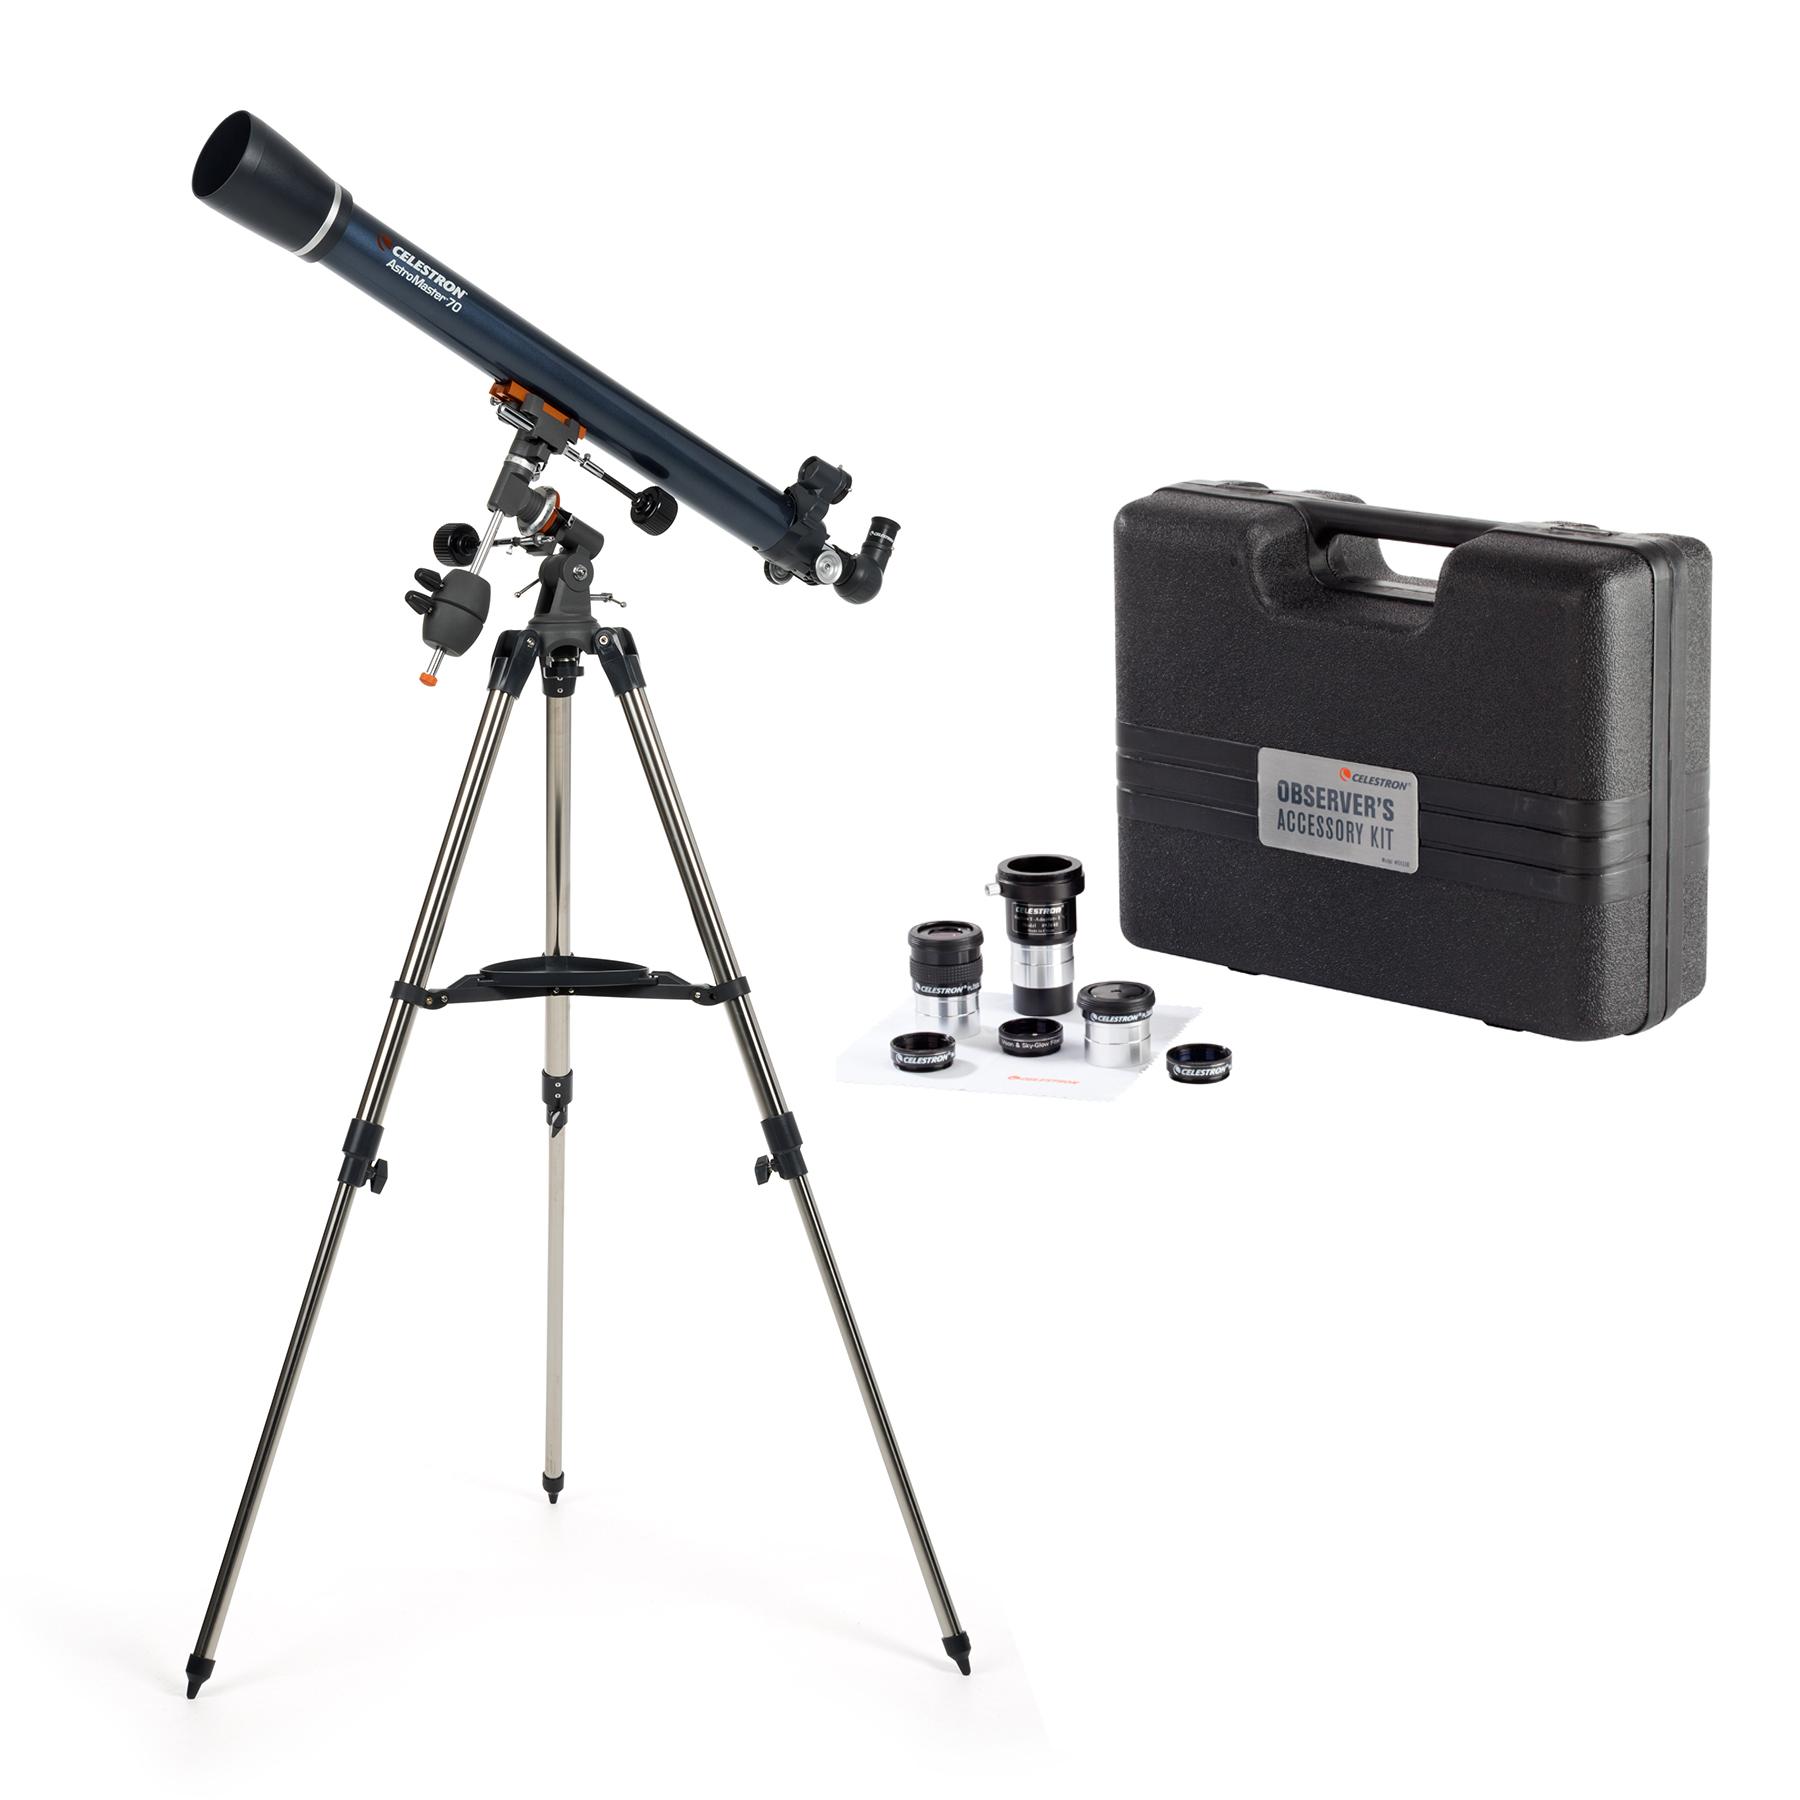 Celestron PowerSeeker 70EQ Refractor with Accessory Kit